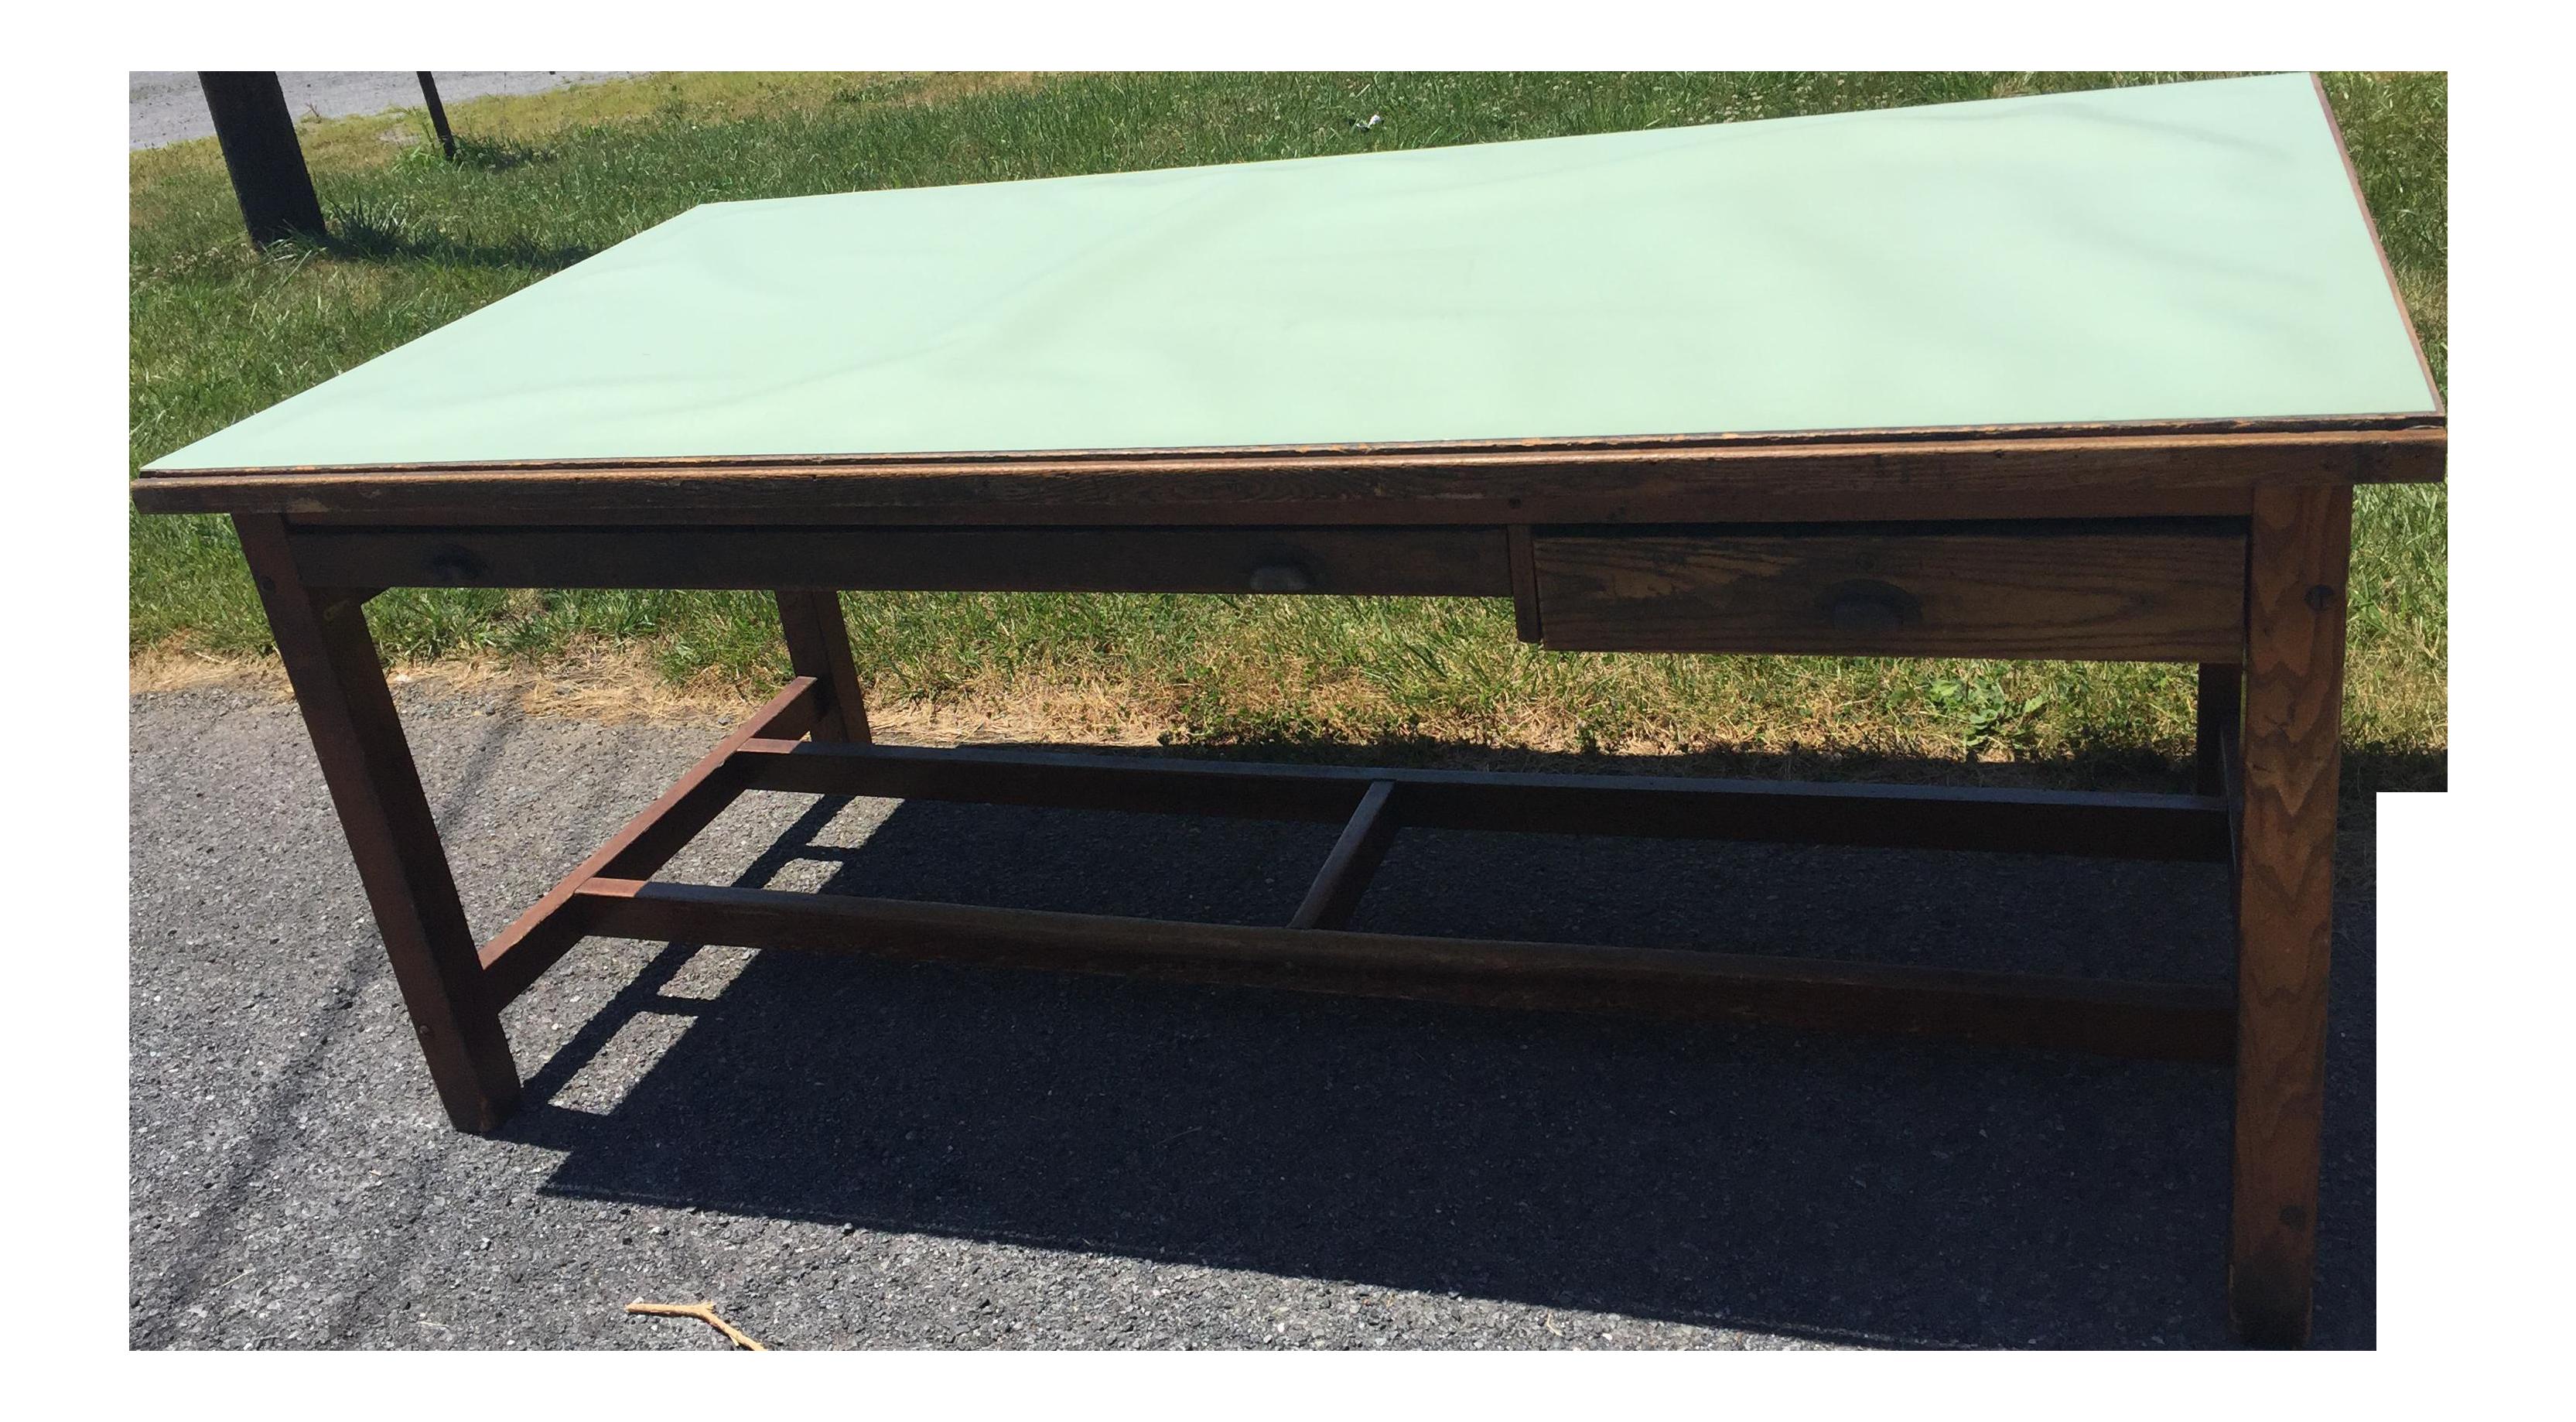 Vintage Industrial Hamilton Economy Wood Drafting Table